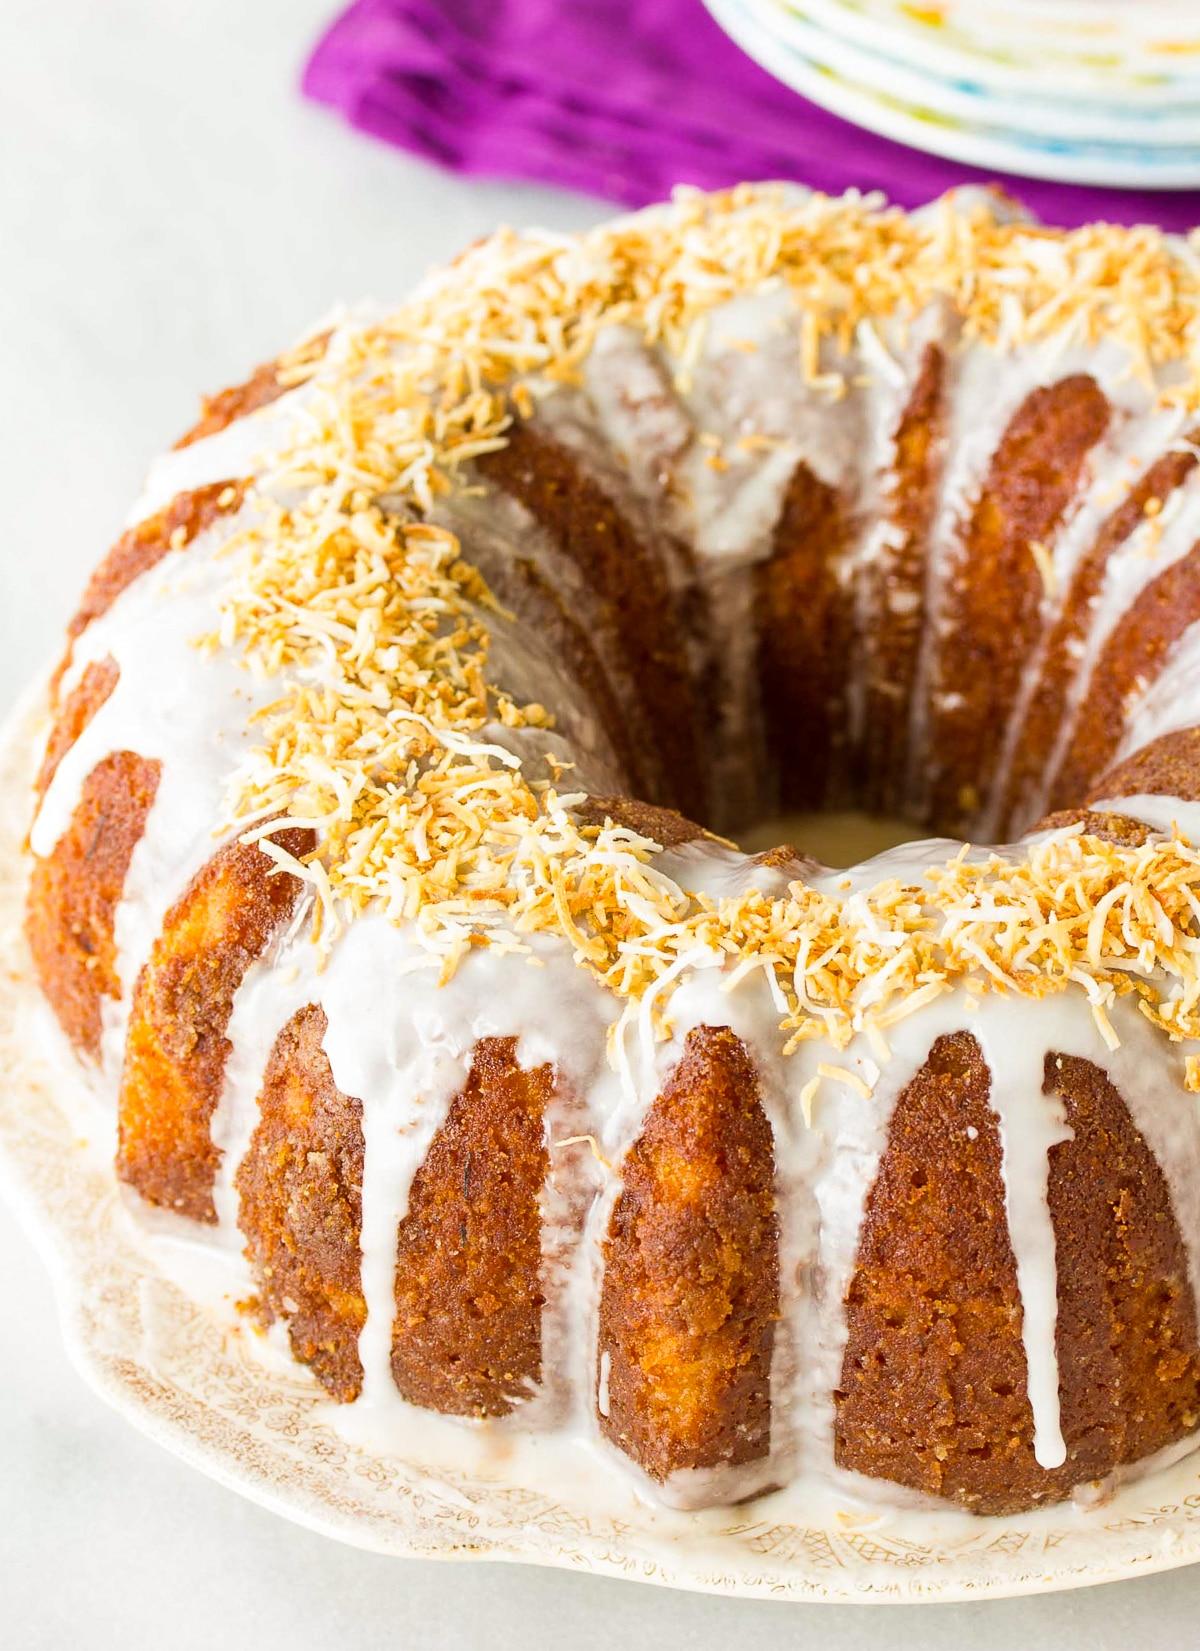 Spiced Rum Cake Recipe #ASpicyPerspective #bundtcake #spicecake #rum #rumcake #caribbean #holiday #coconut #pineapple